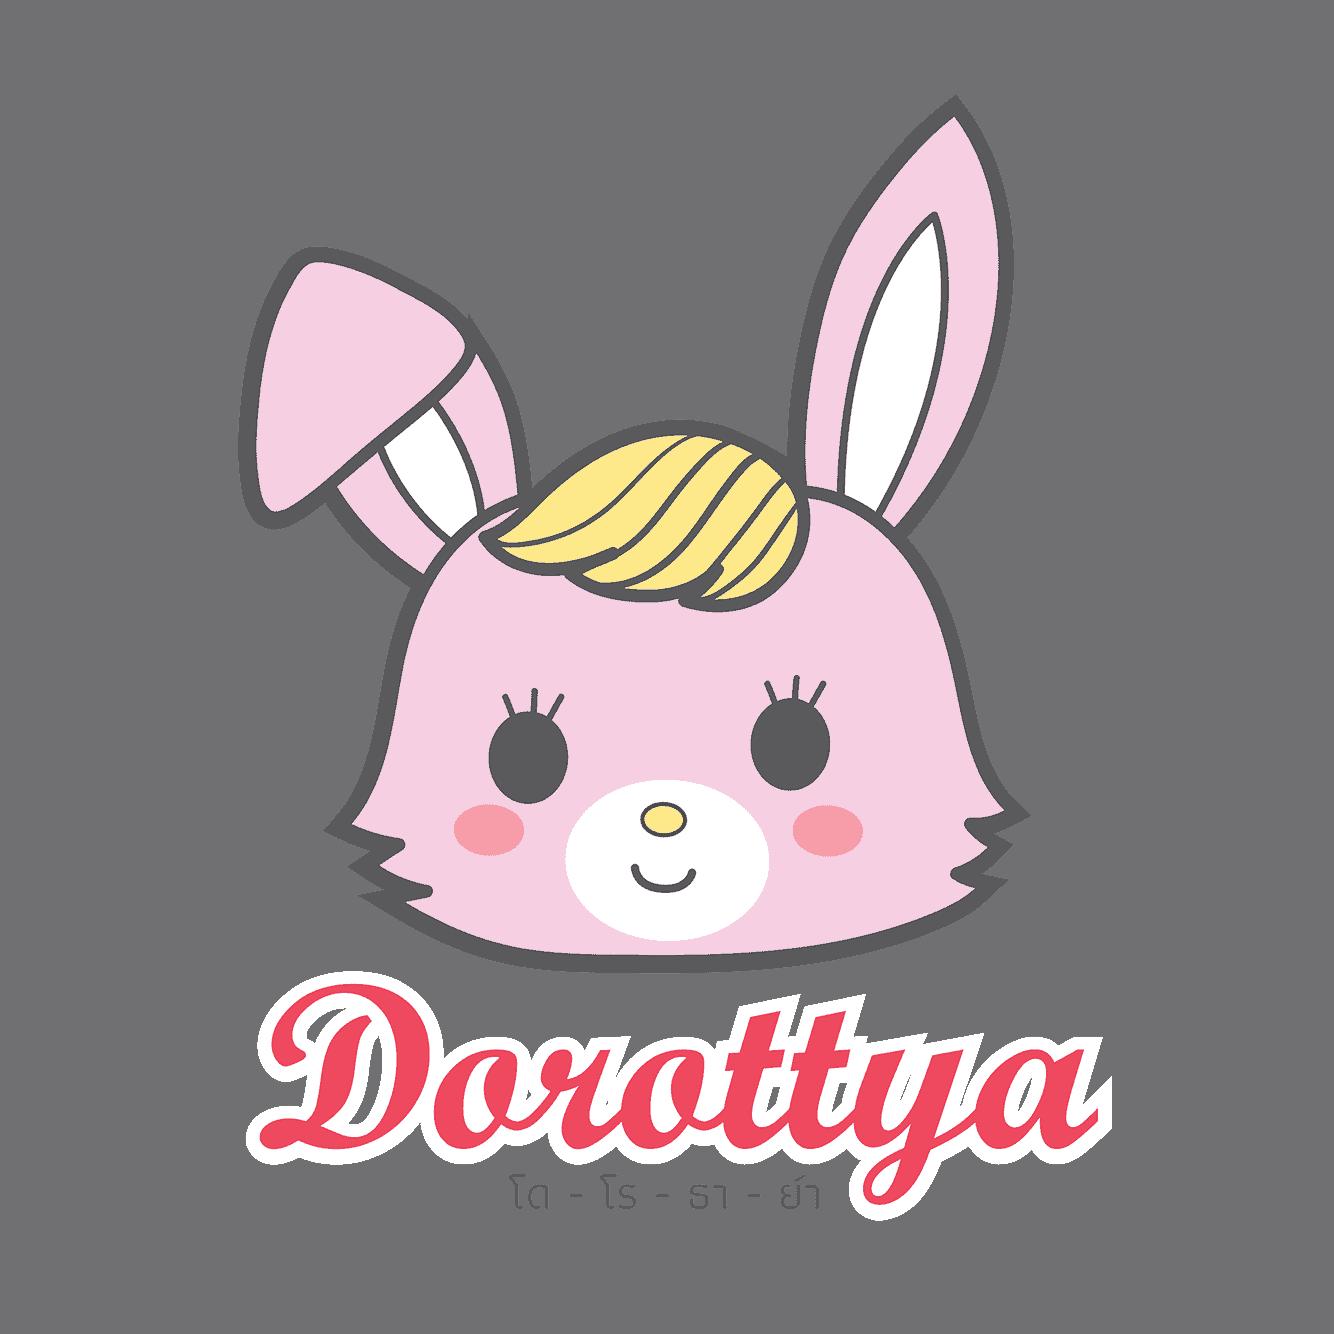 Dorottya Scarf – ผ้าพันคอ ผ้าคลุมไหล่